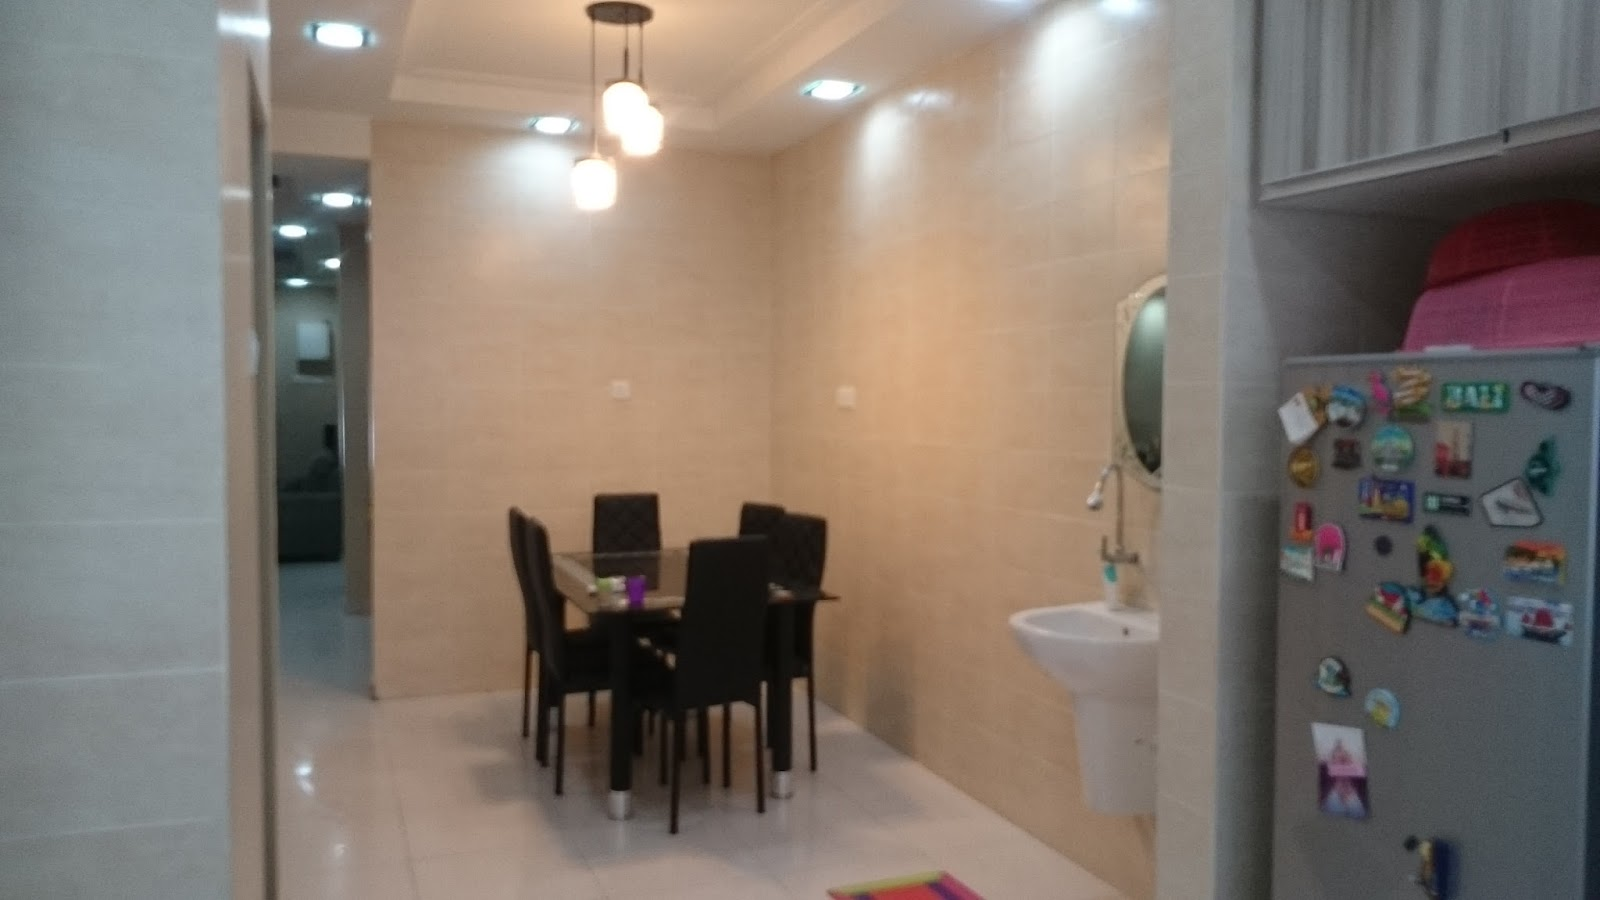 Ruang Makan Yang Luas Dilengkapi Sinki Basuh Tangan